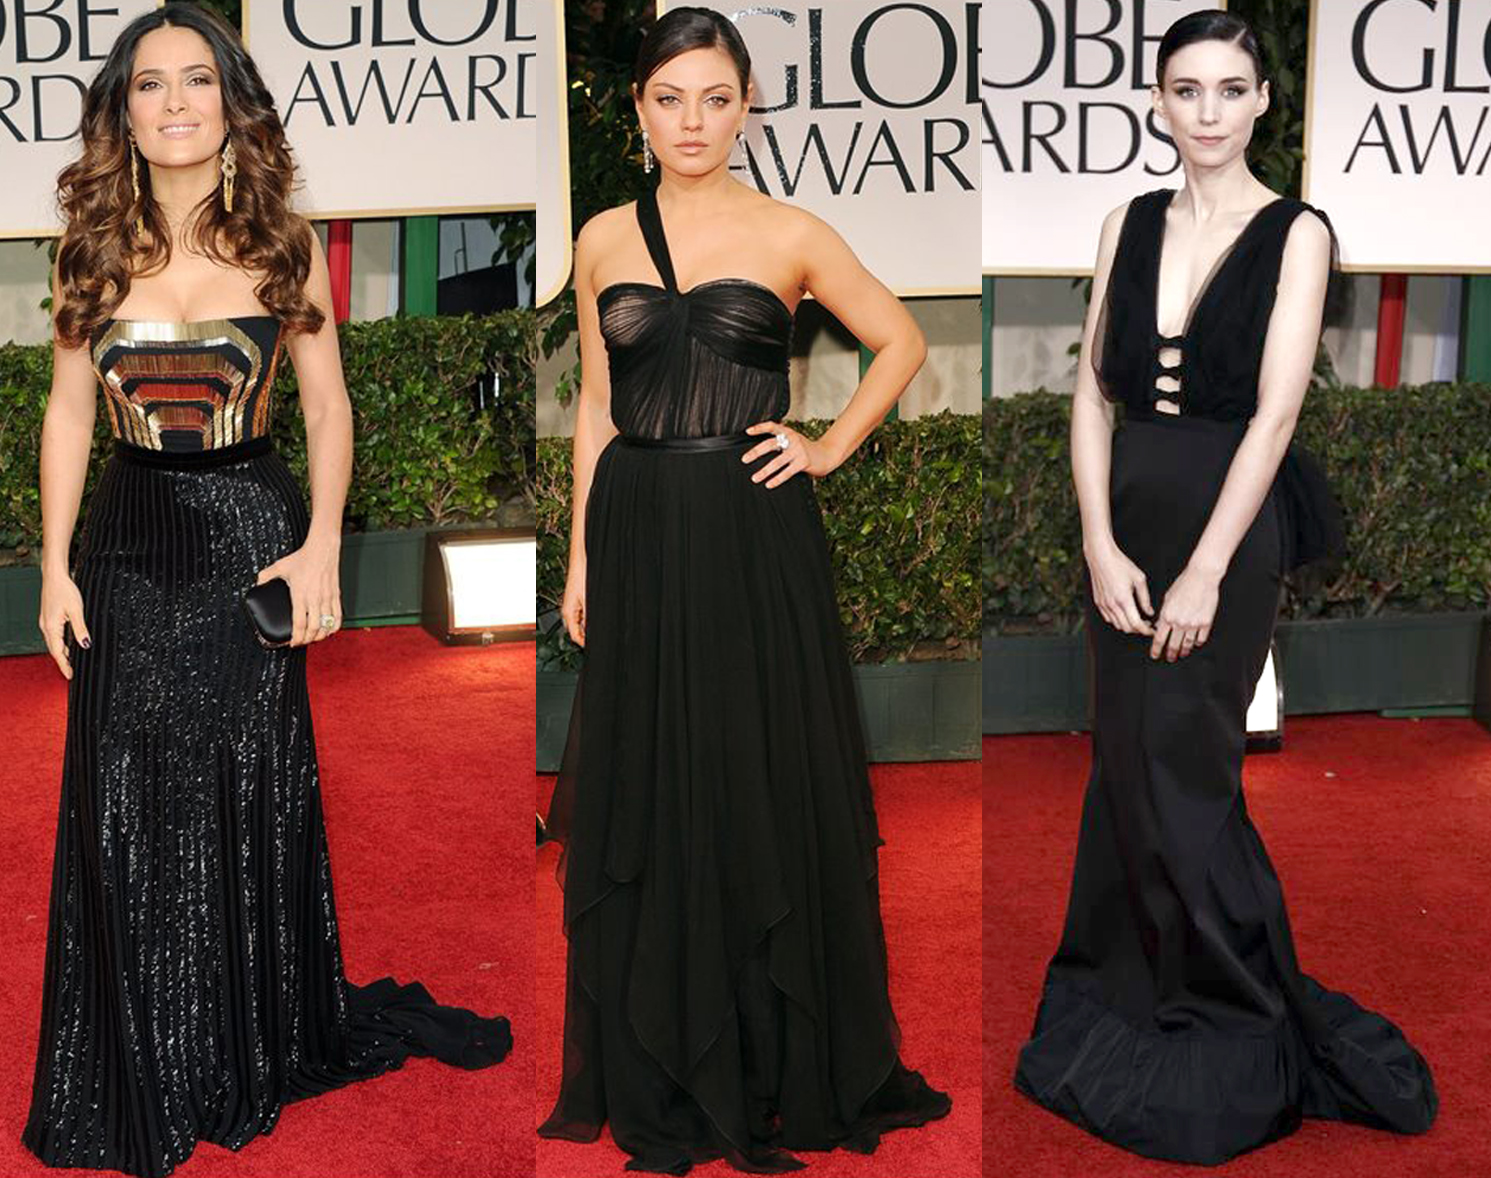 http://2.bp.blogspot.com/-tYhm8ZlZmcI/TxQhytmkZwI/AAAAAAAAErc/oMlmd3dh7w0/s1600/Golden_Globes_Black.jpg